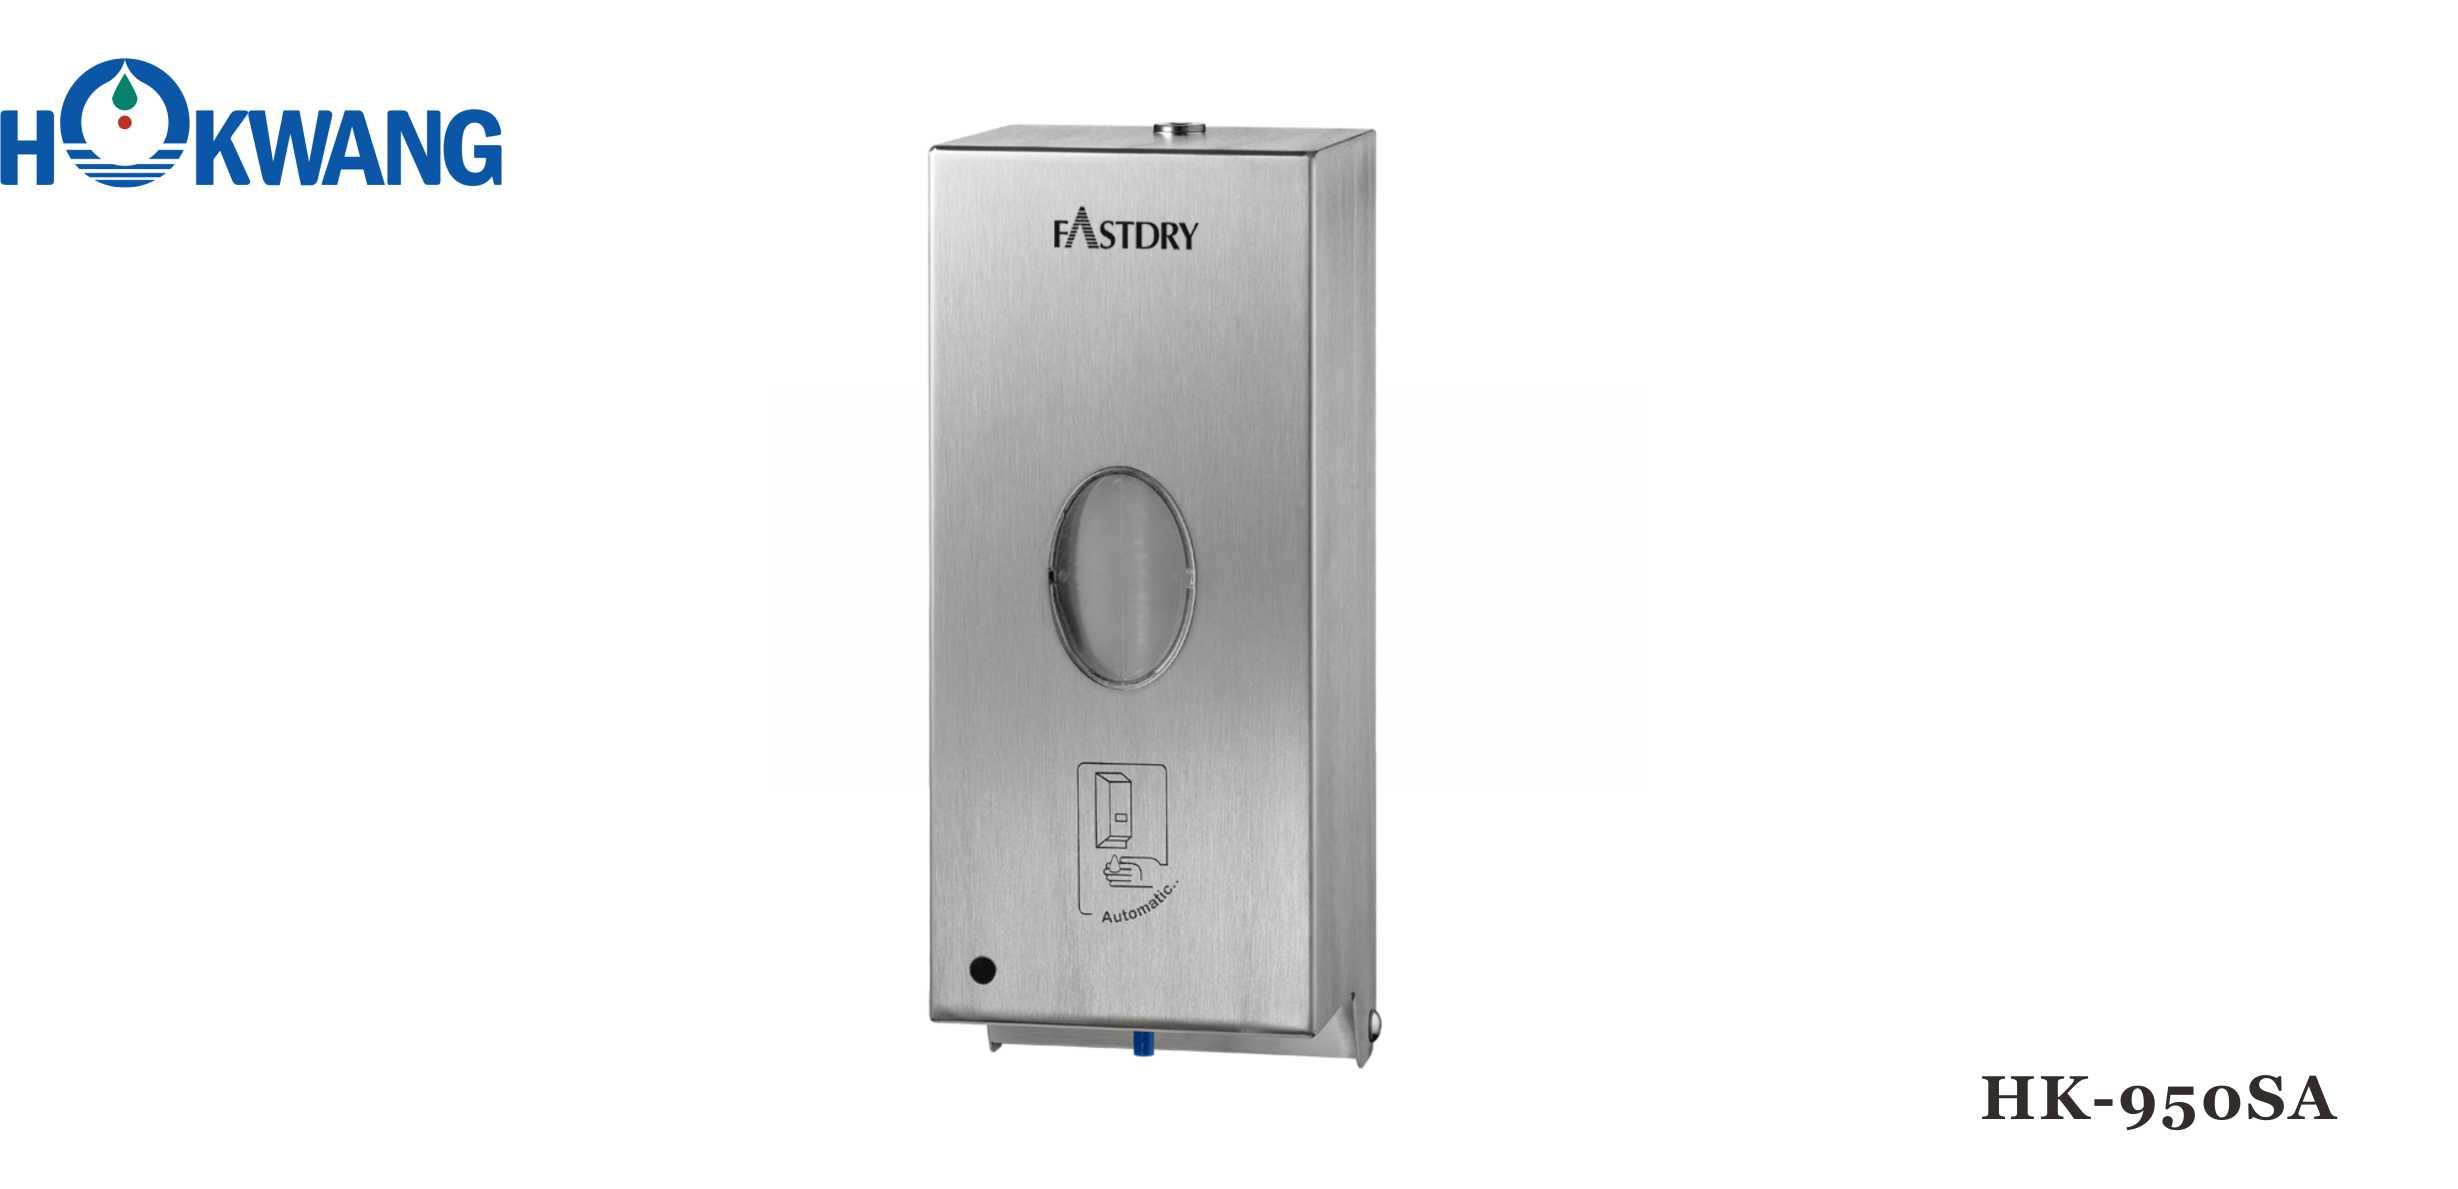 HK-950SA Stainless Steel Auto Liquid Soap Dispenser